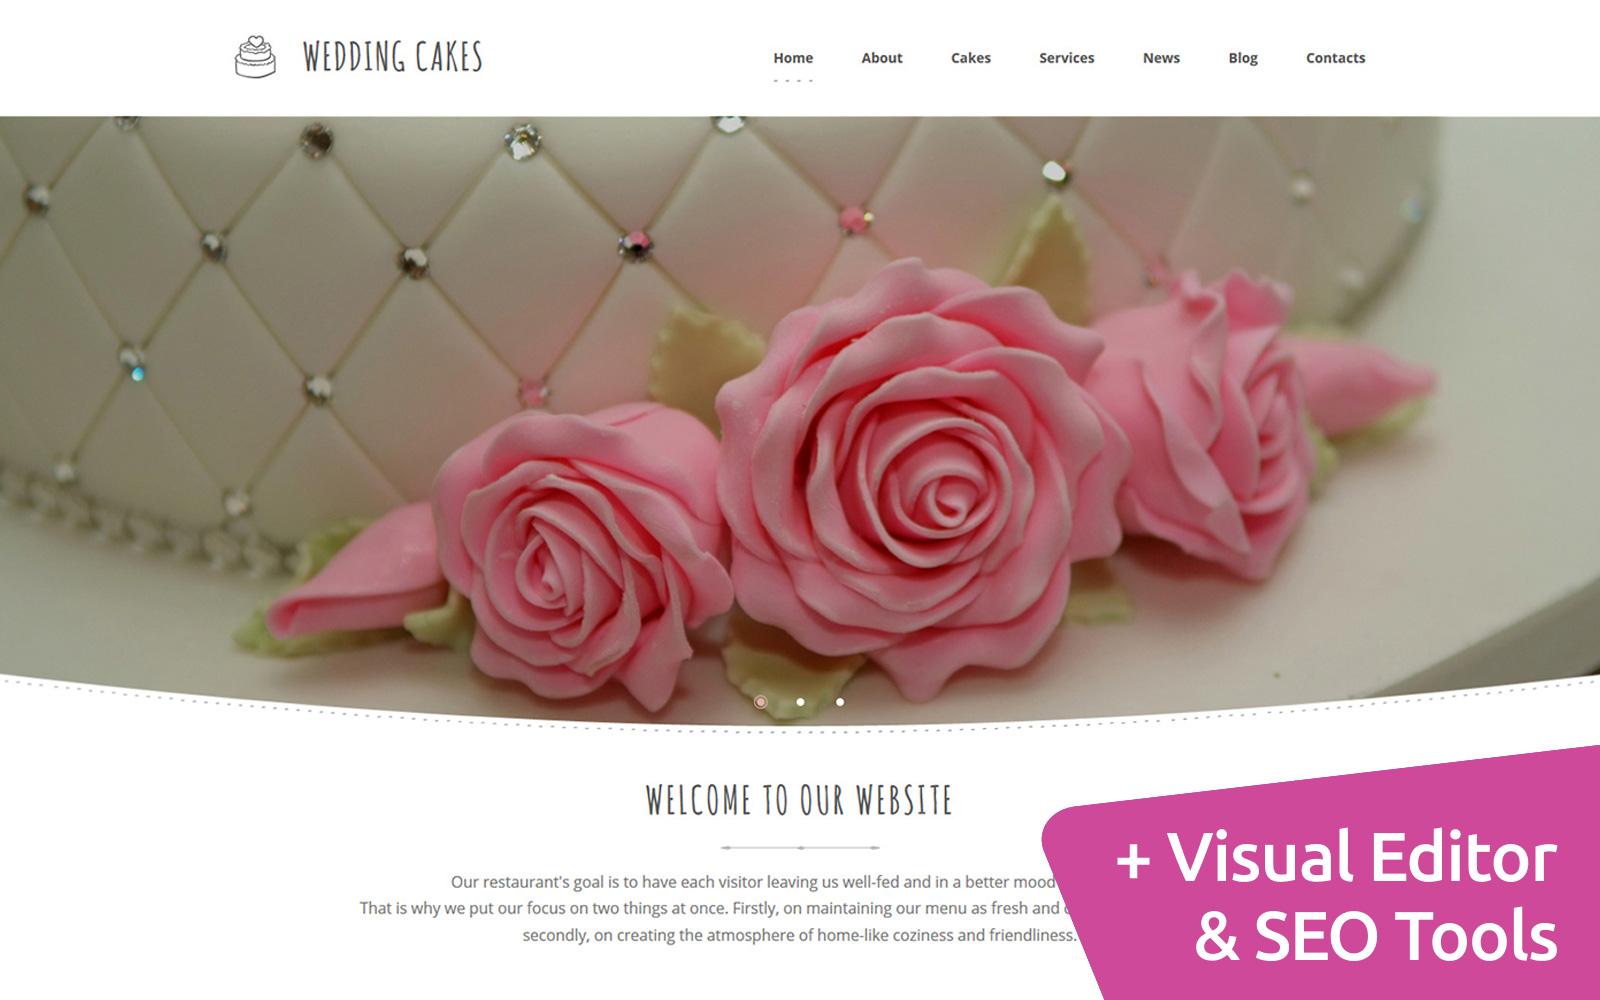 Responsive Wedding Cakes Moto Cms 3 #59138